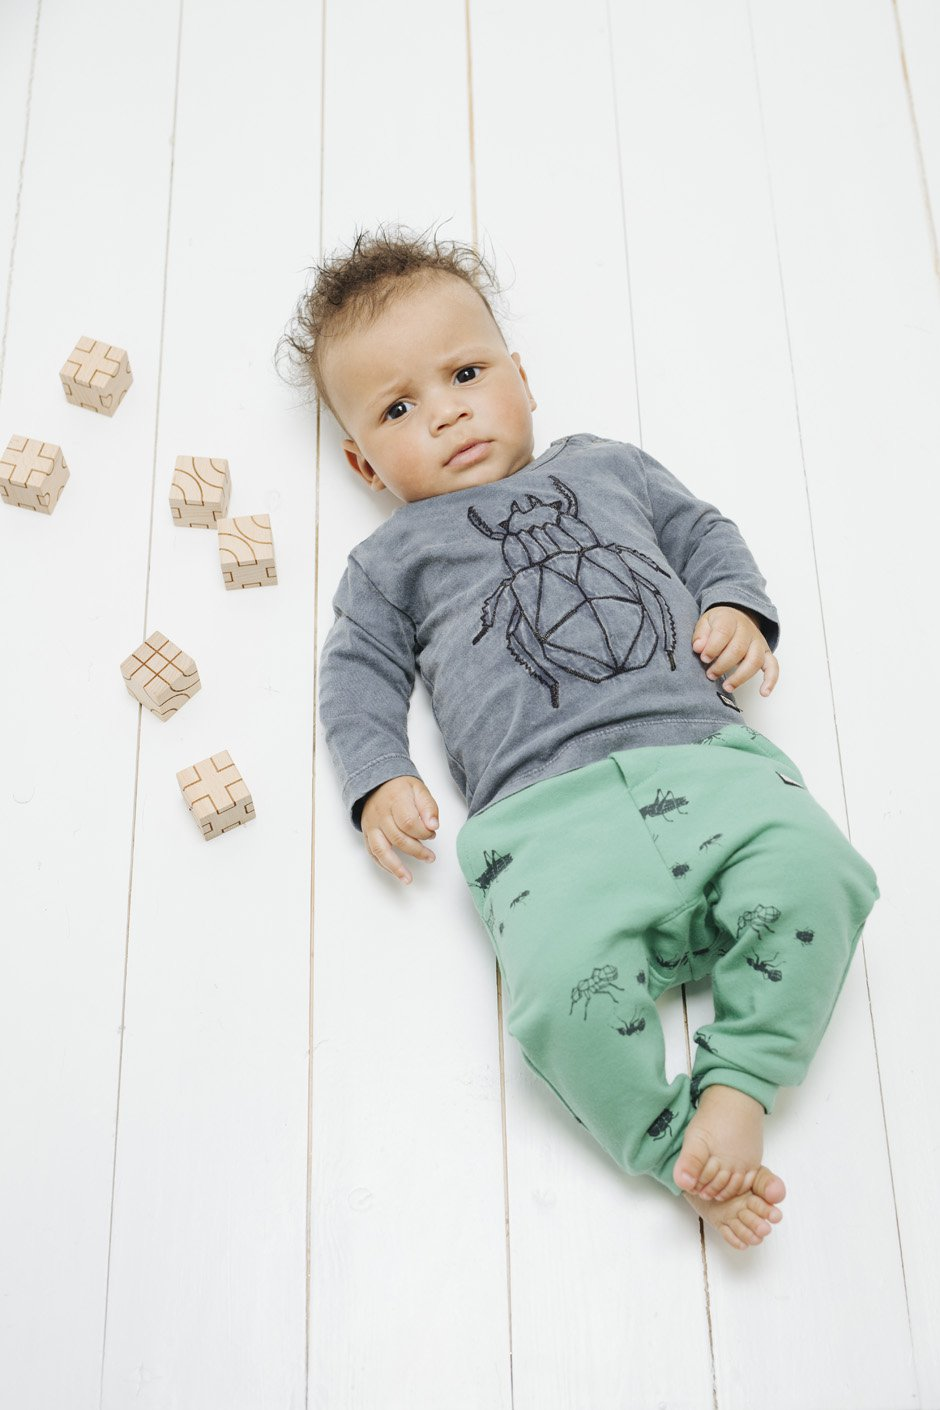 baby jongen, babymode, babykleding voorjaar zomer 2019, babykleding jongen